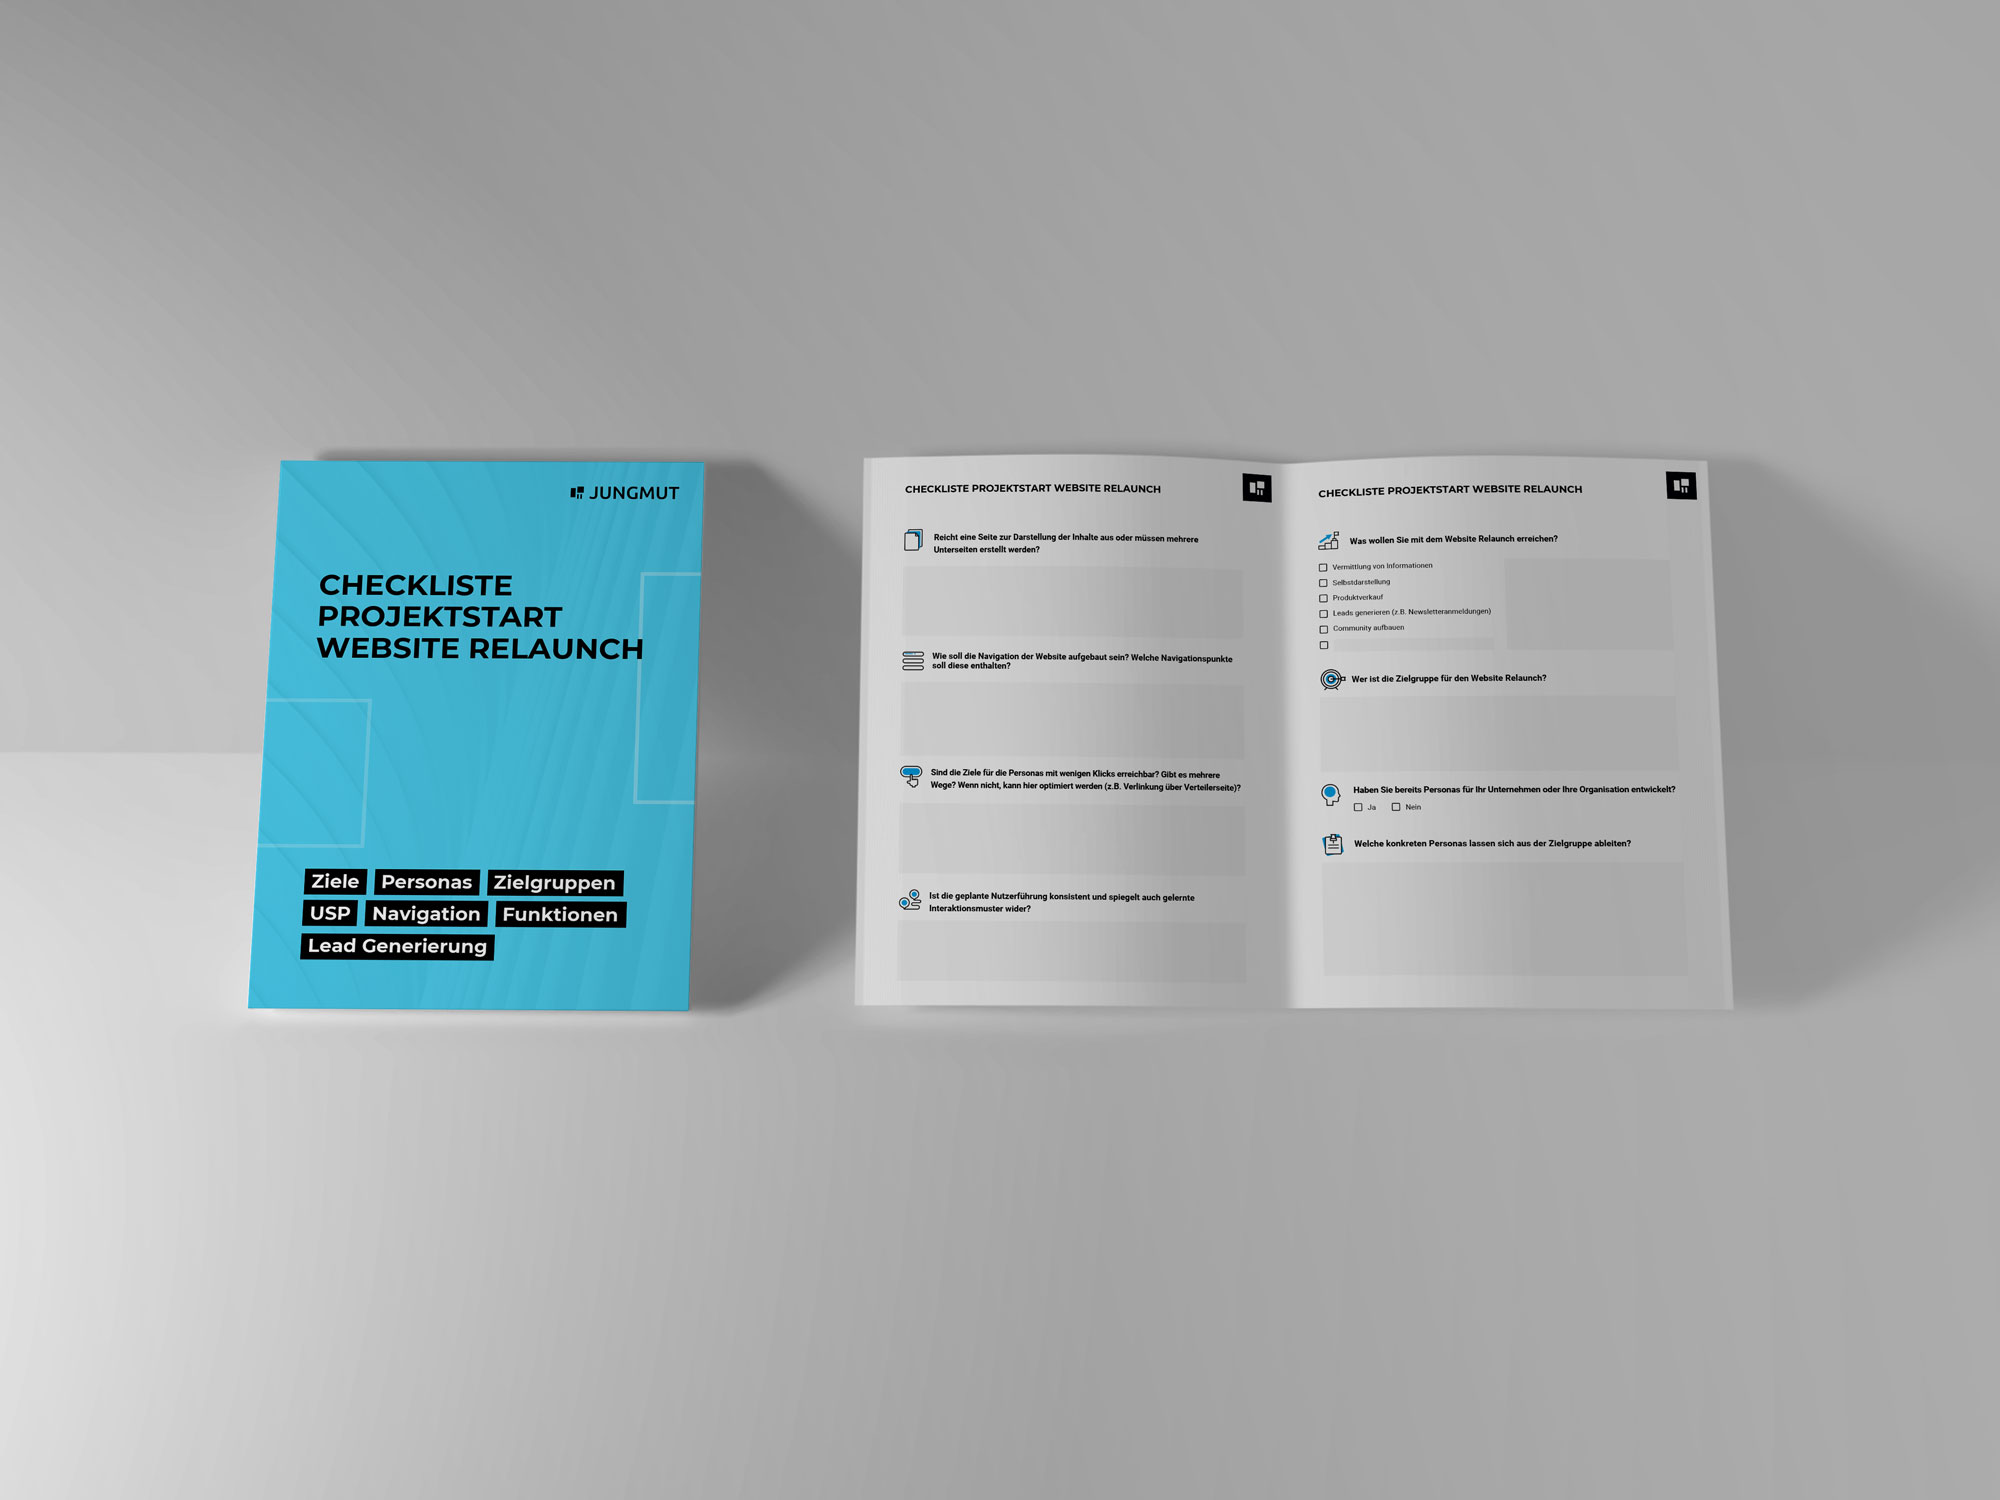 JUNGMUT-Website-Relaunch-Checkliste-Mockup-Magazin